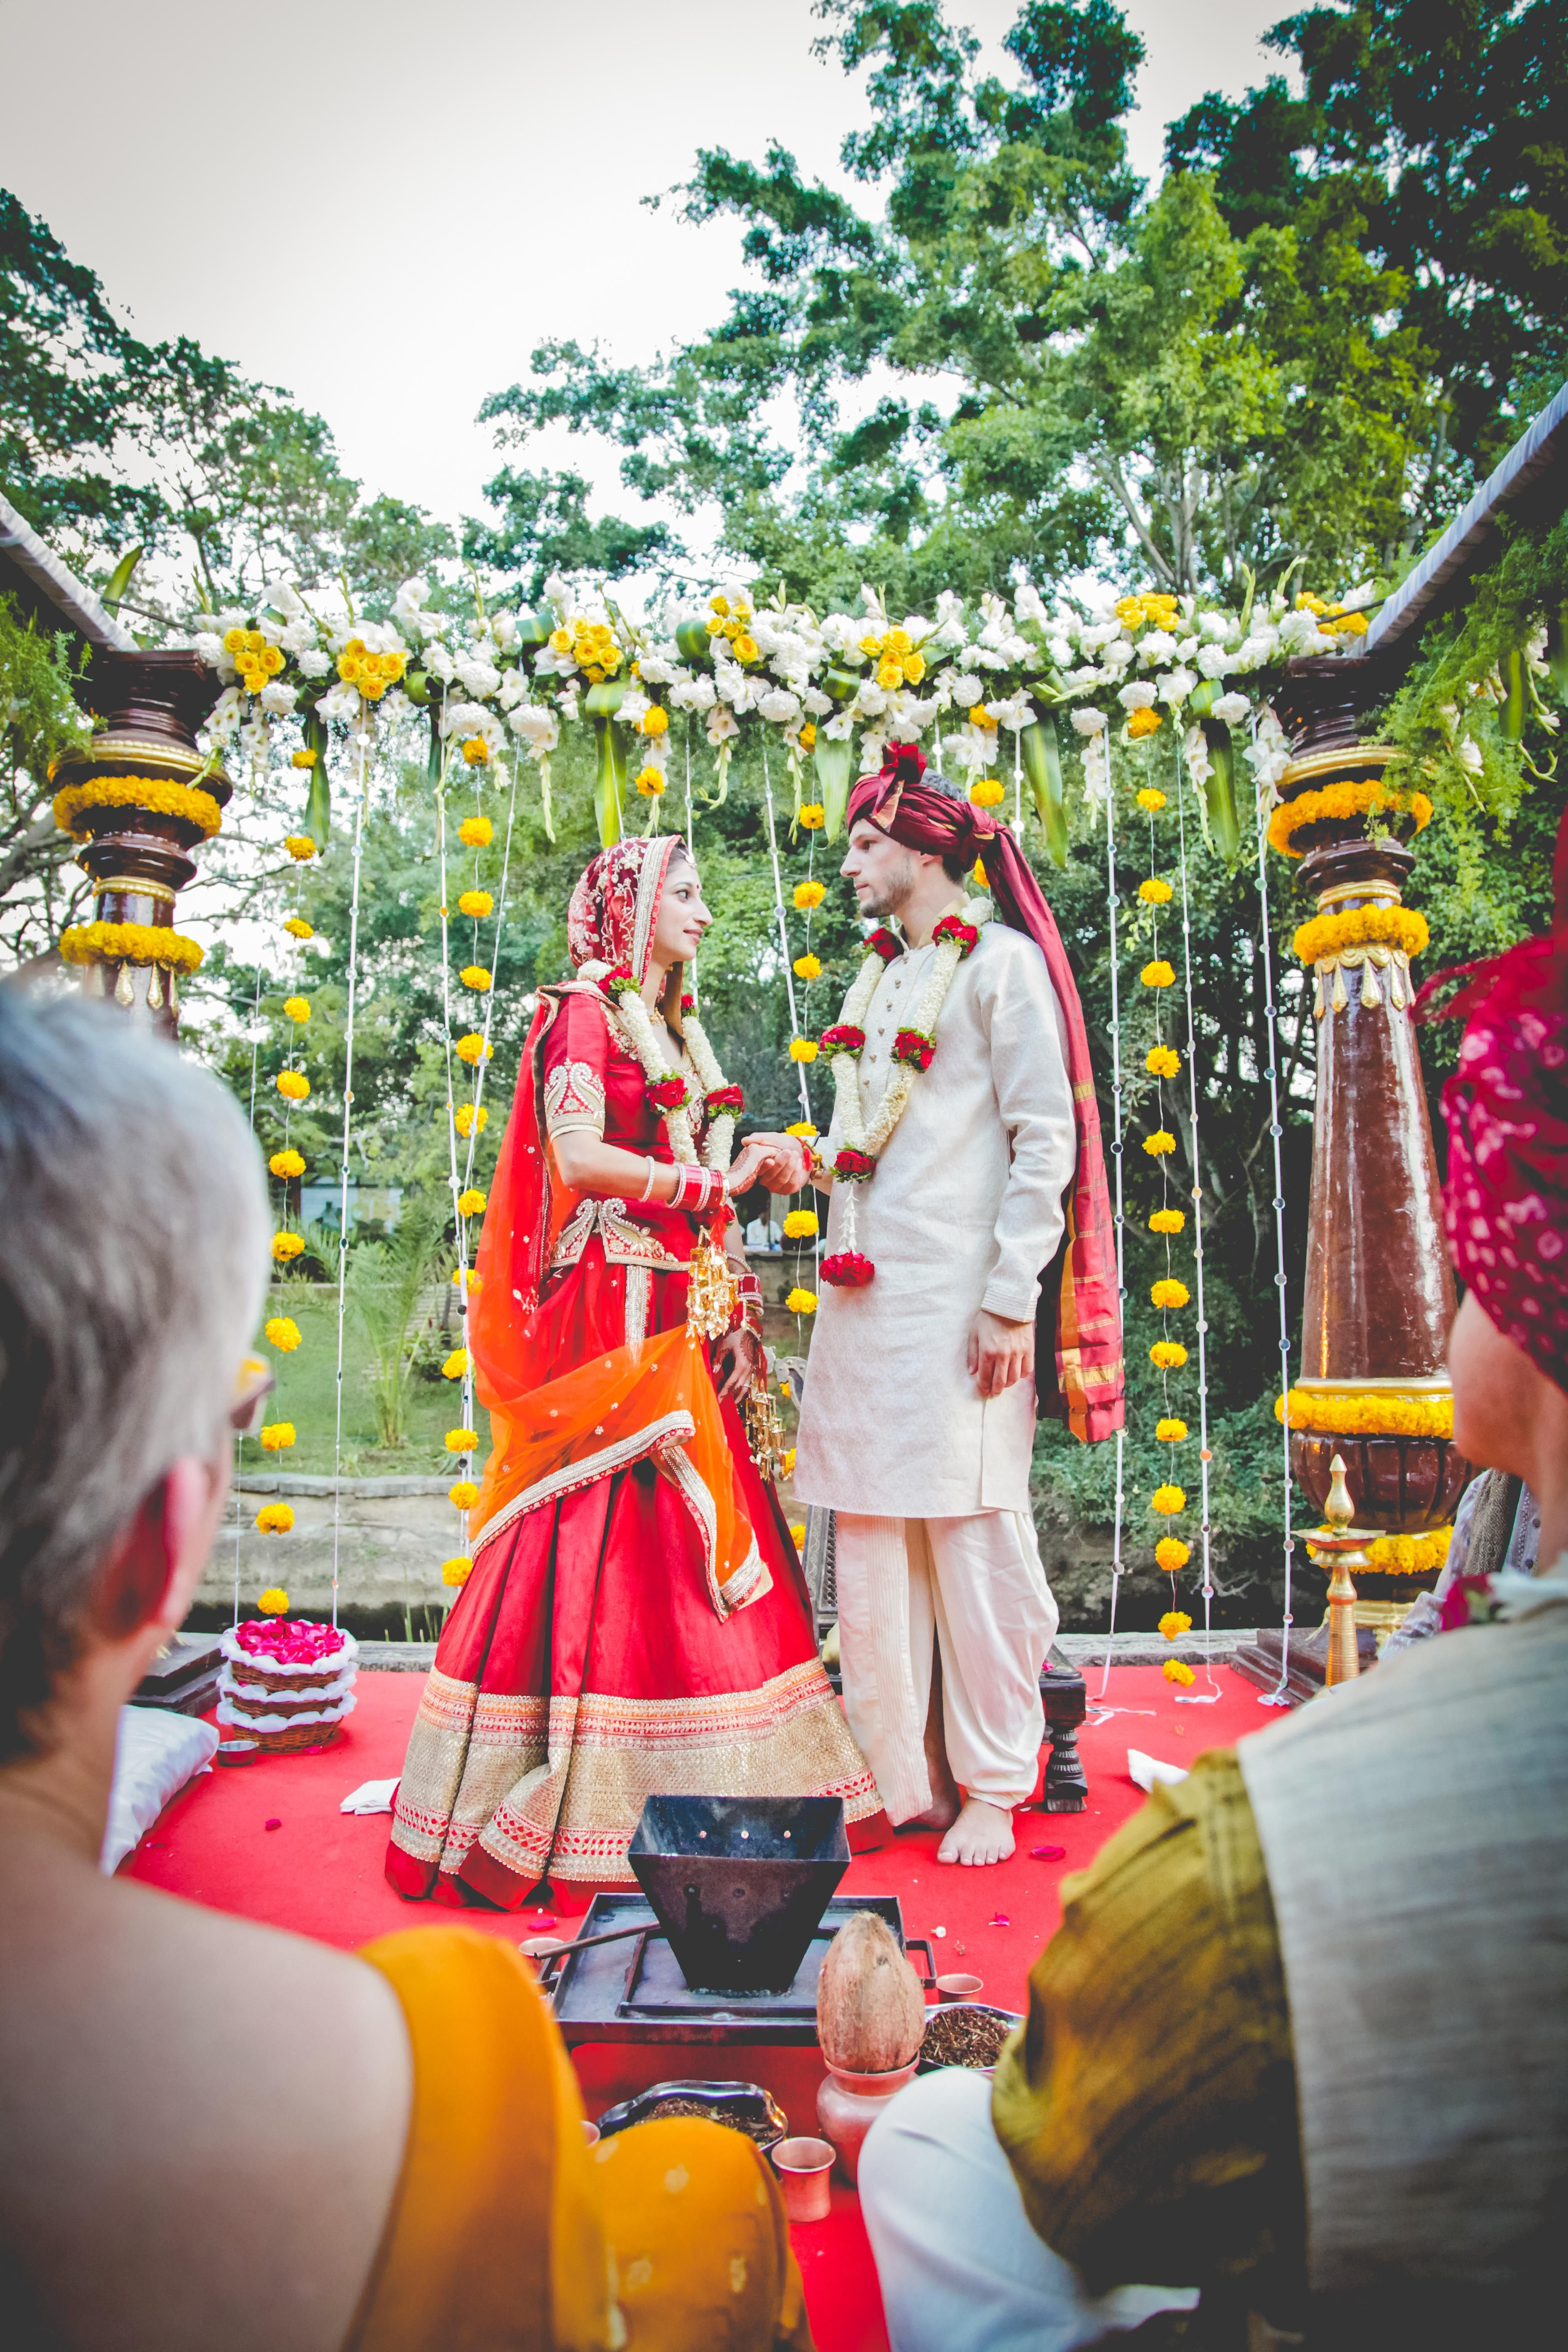 Weddings Abroad Destinations Destination Coffee Staining Wedding S Indian